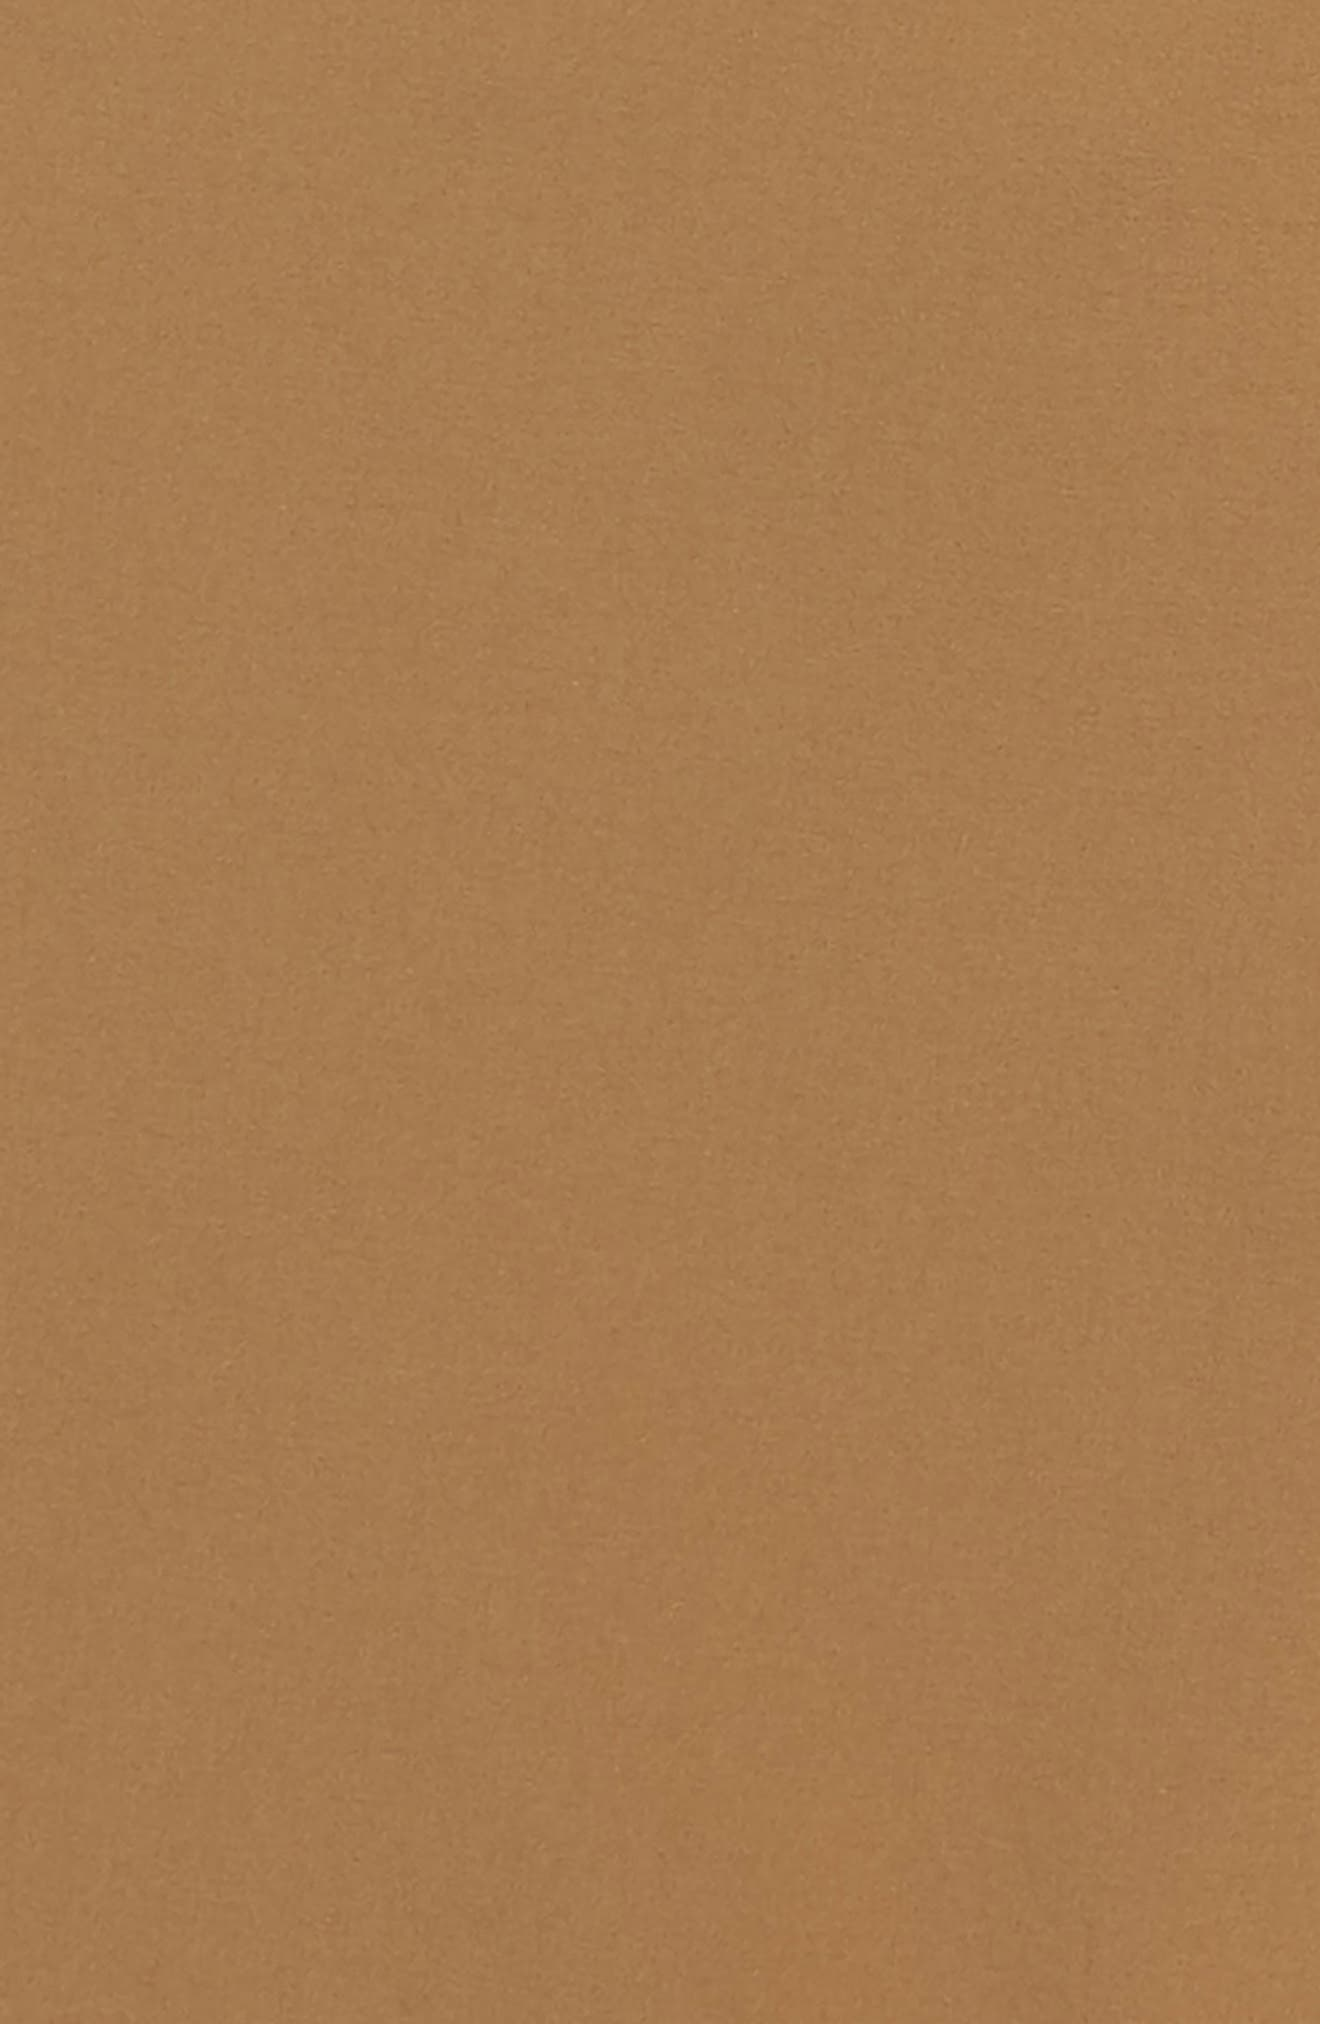 Authentic Decksider Hybrid Shorts,                             Alternate thumbnail 5, color,